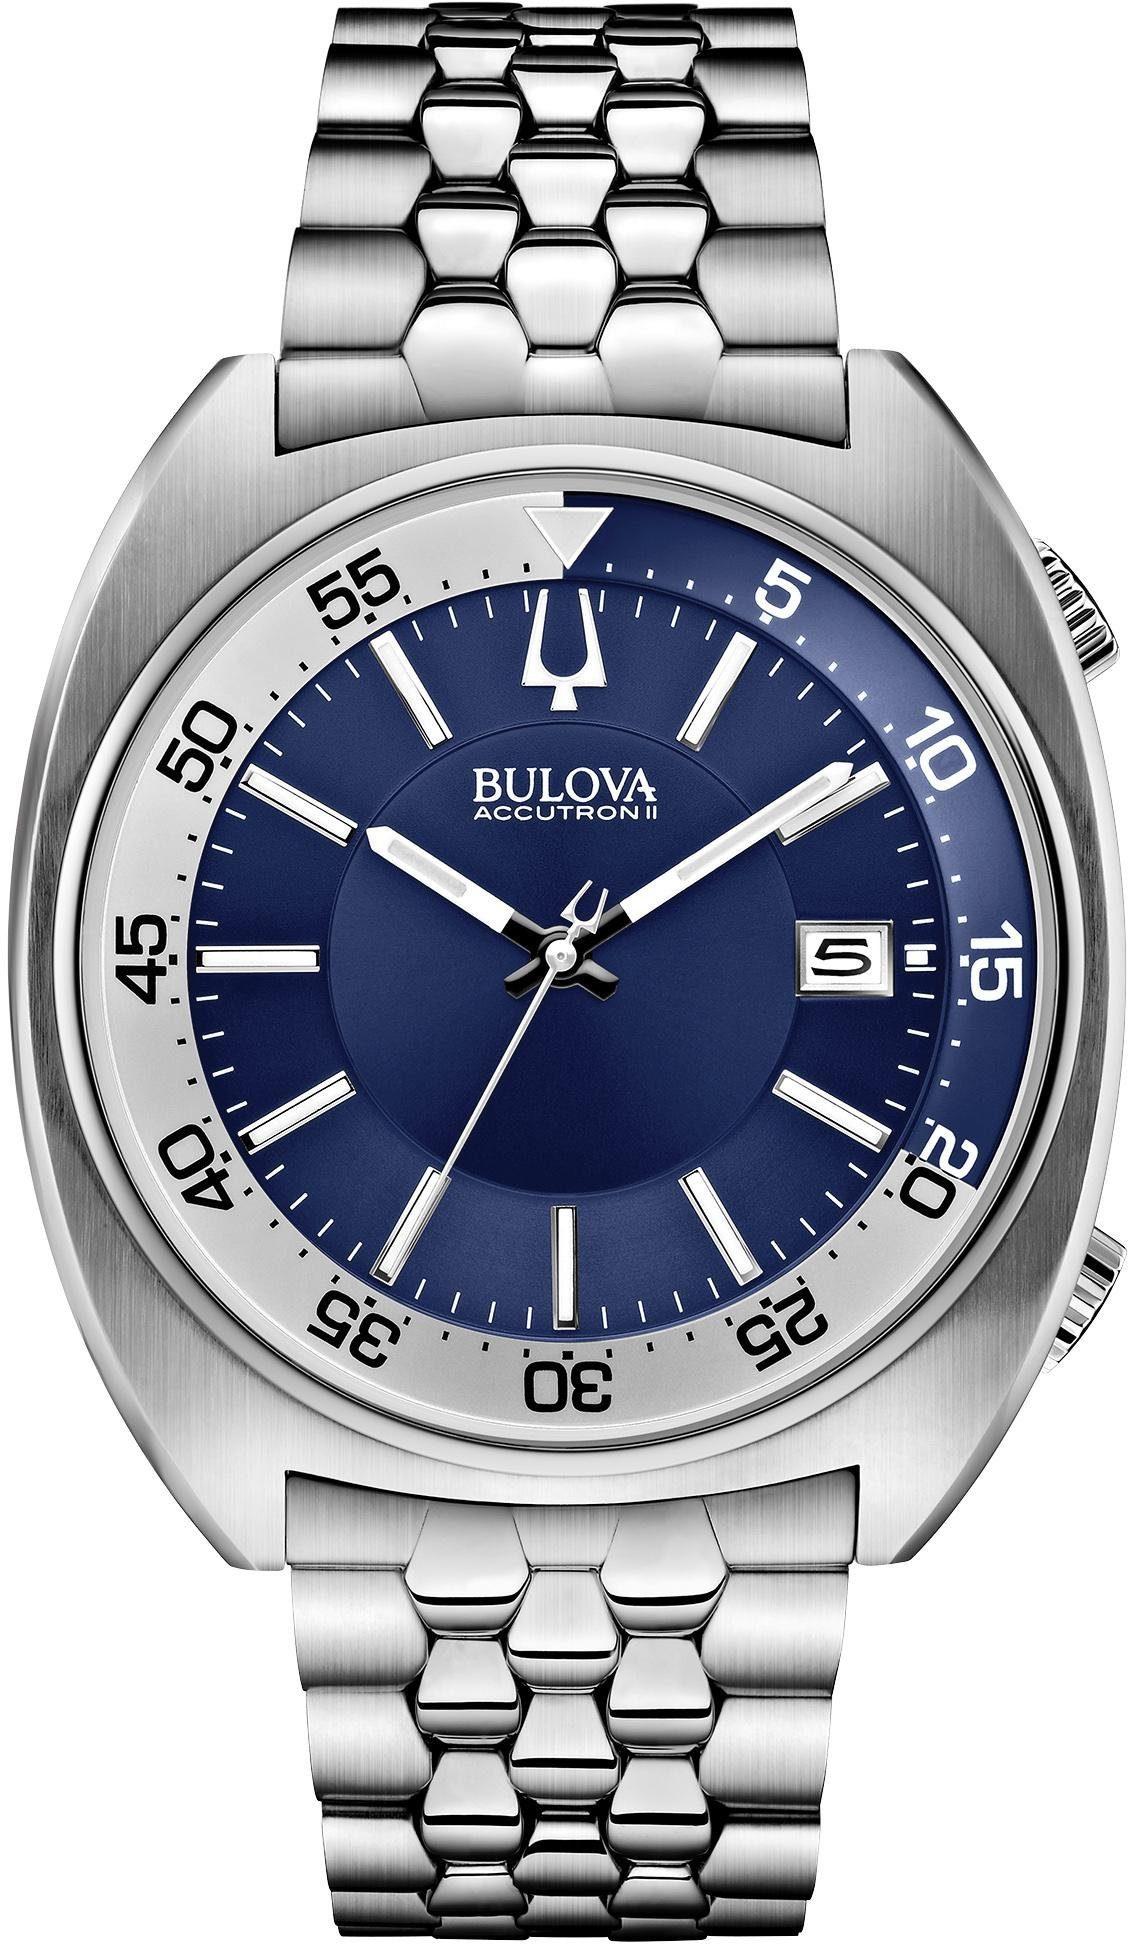 Bulova Quarzuhr »Snorkel, 96B209«